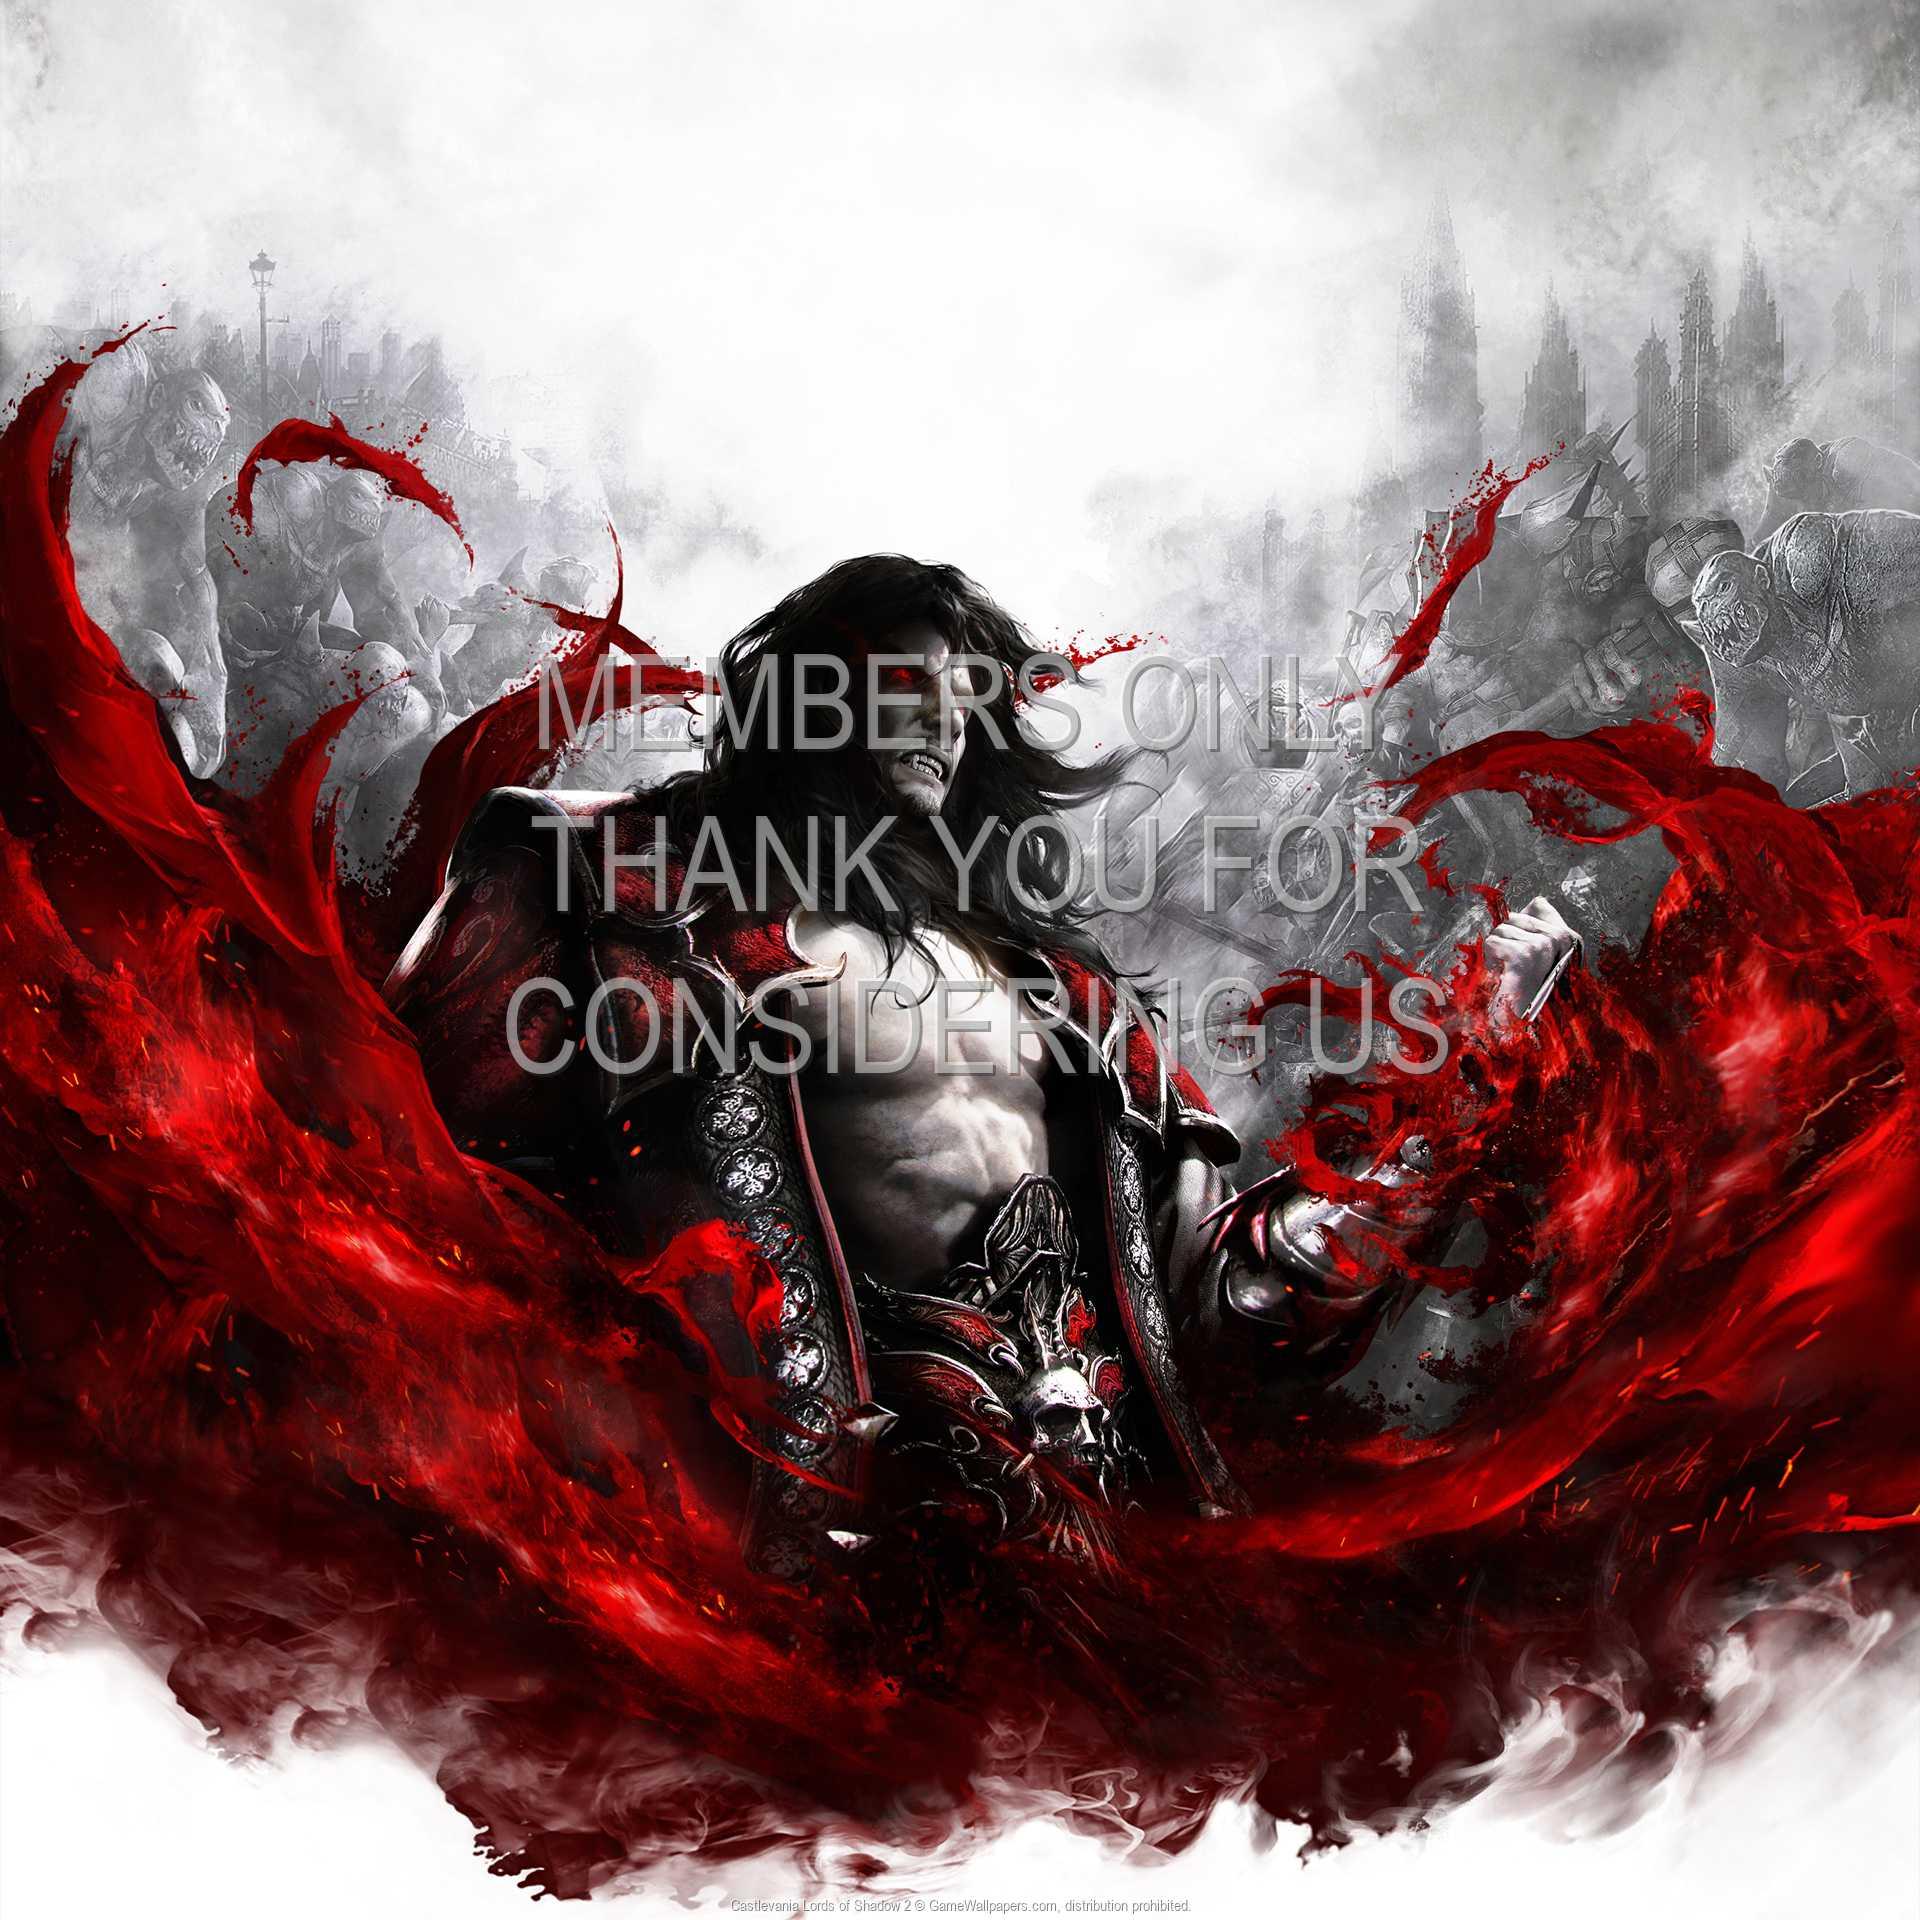 Castlevania: Lords of Shadow 2 1080p Horizontal Handy Hintergrundbild 03